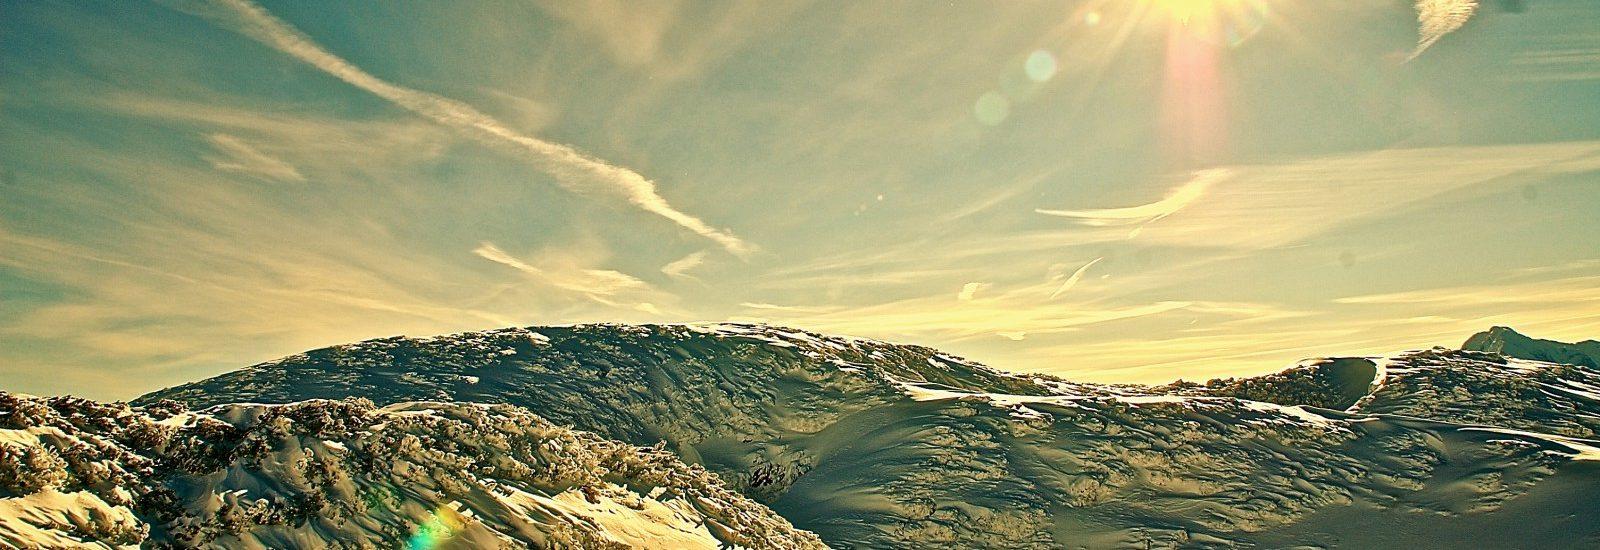 Wunderschönes Panorama vom Untersberg